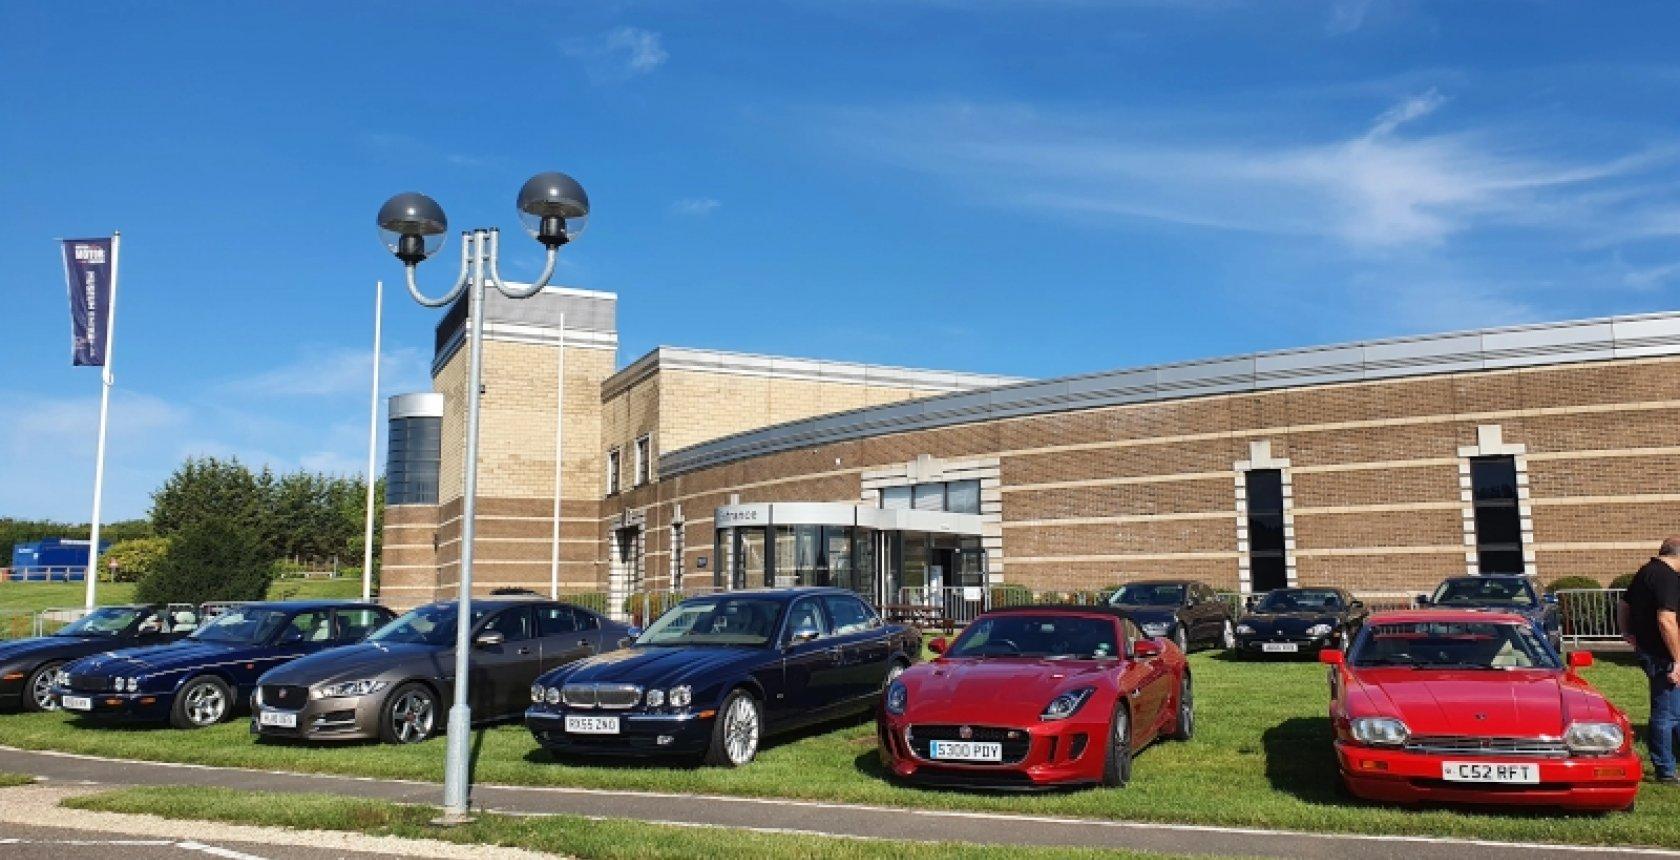 Jaguars At Gaydon